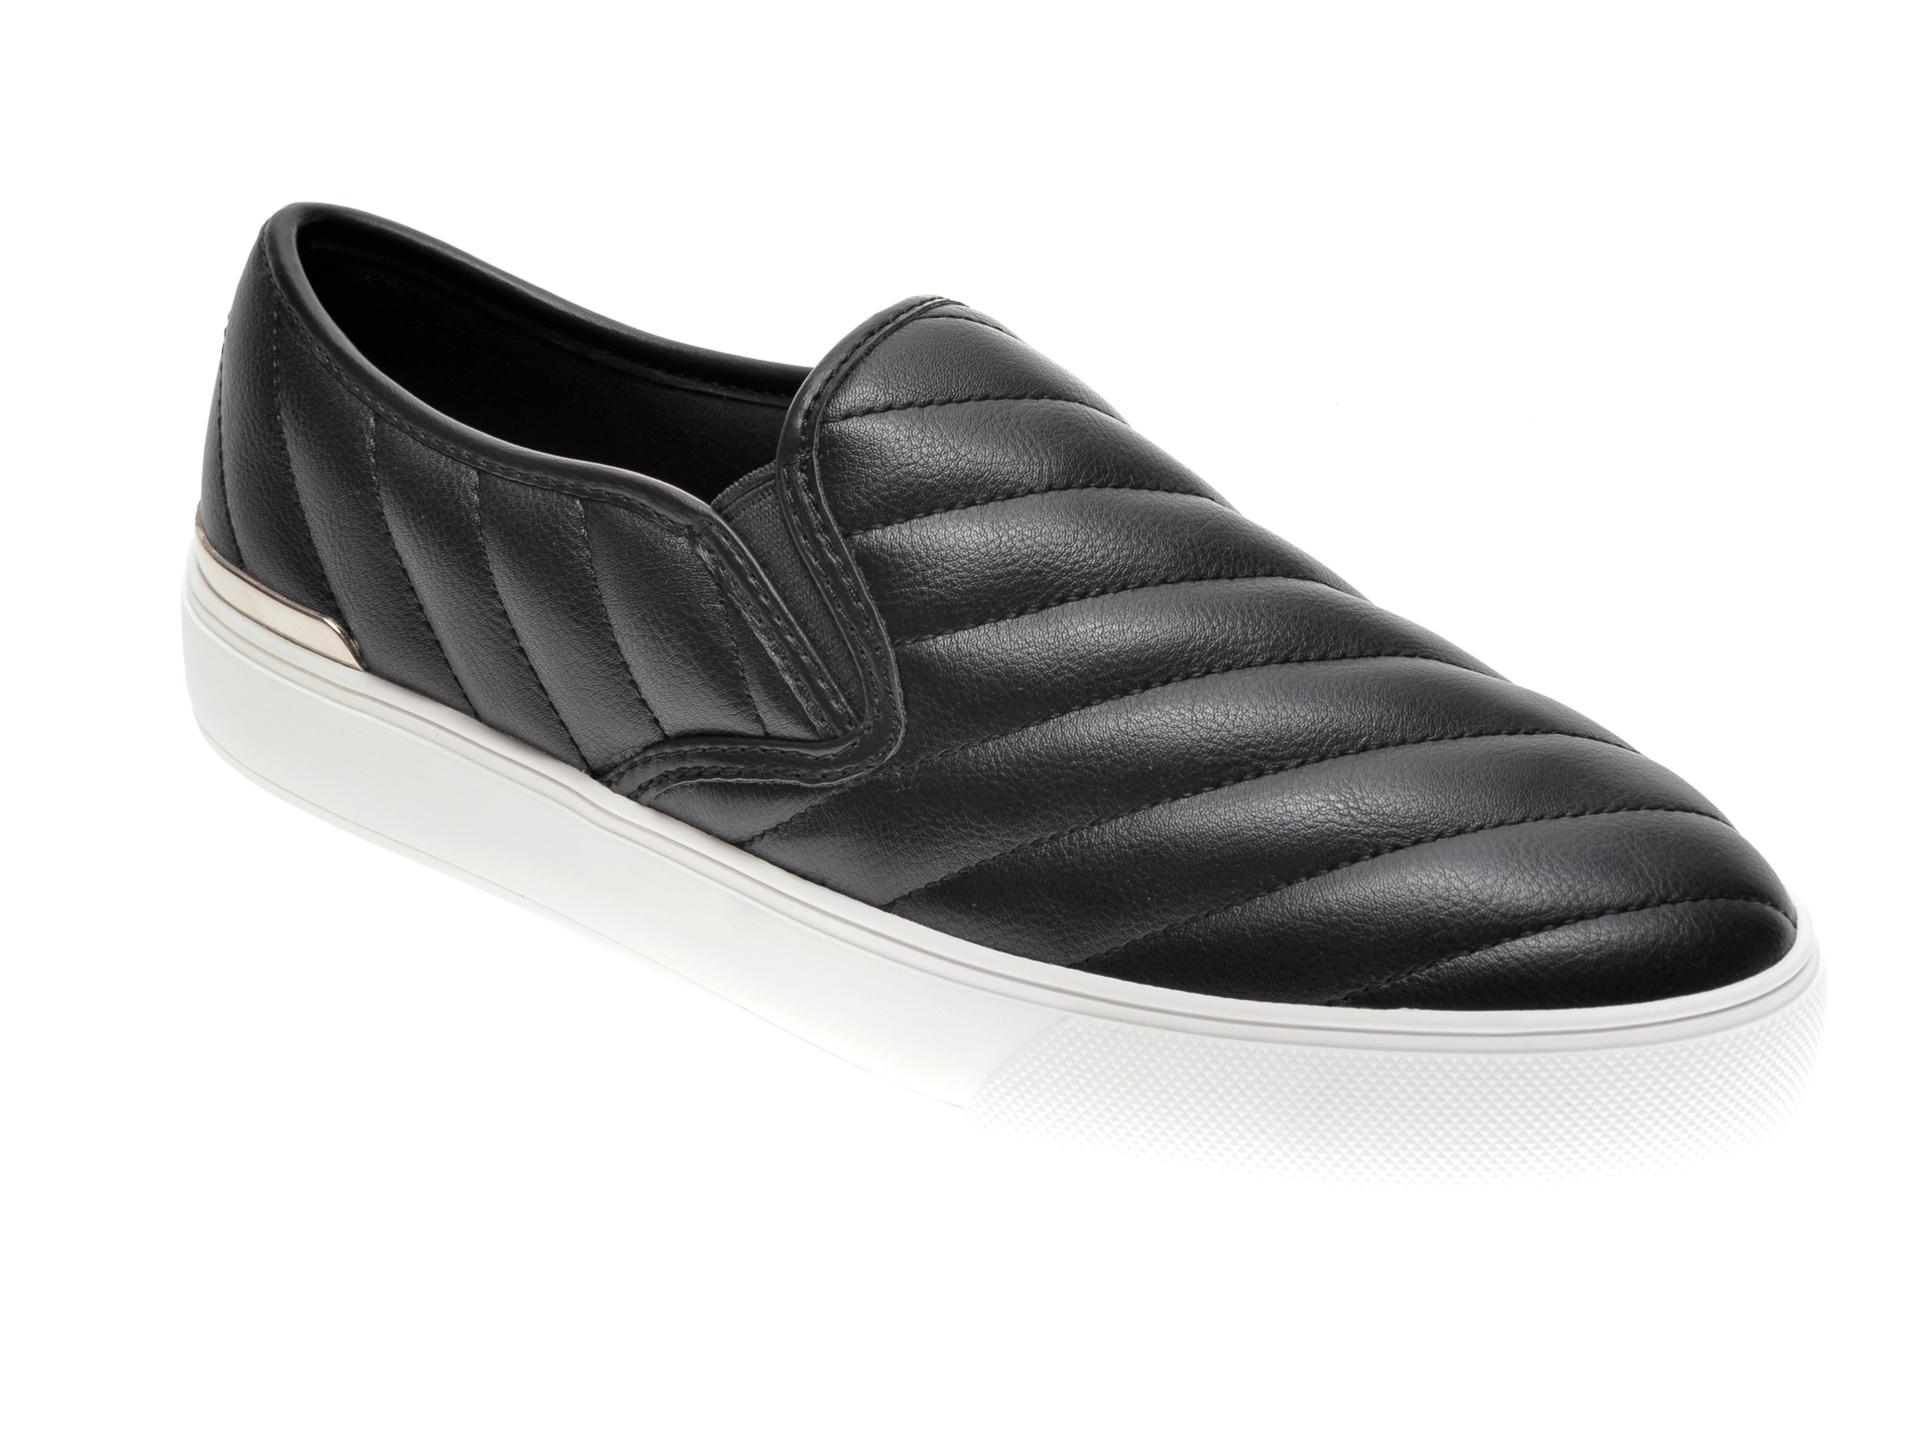 Pantofi ALDO negri, Chevron001, din piele ecologica imagine